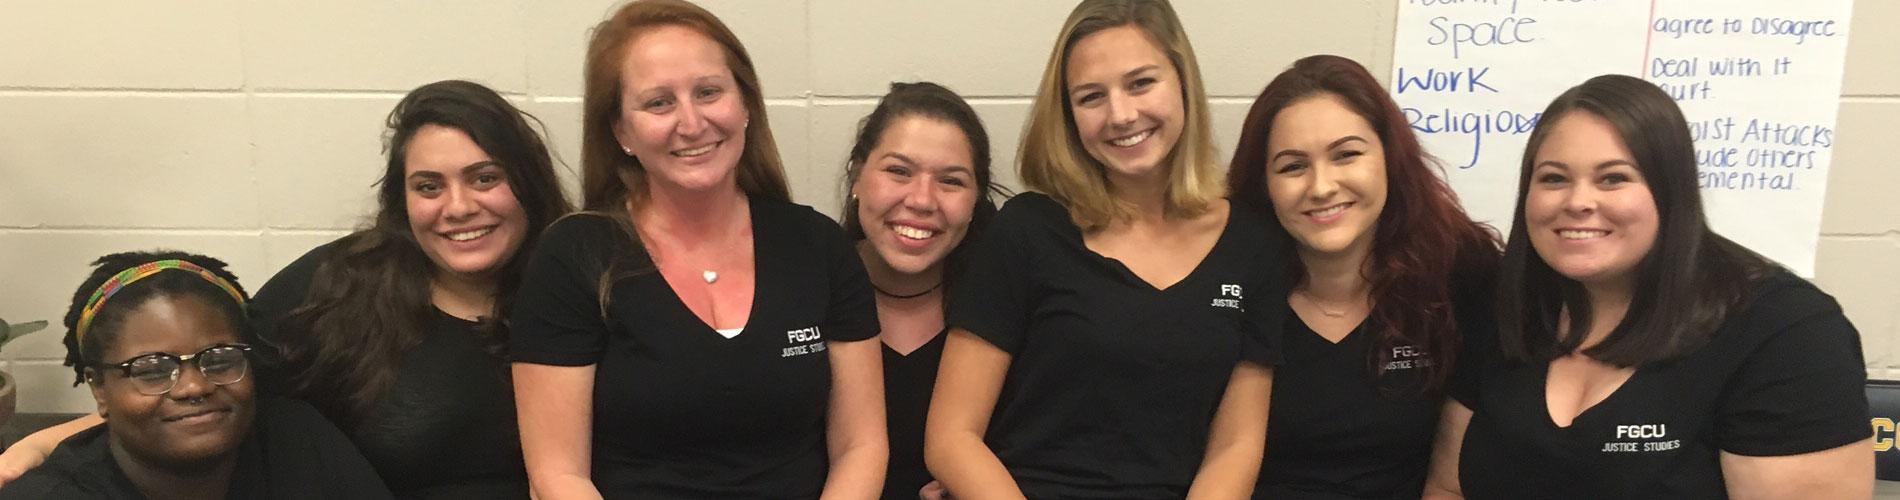 FGCU student mentors spread success at academy